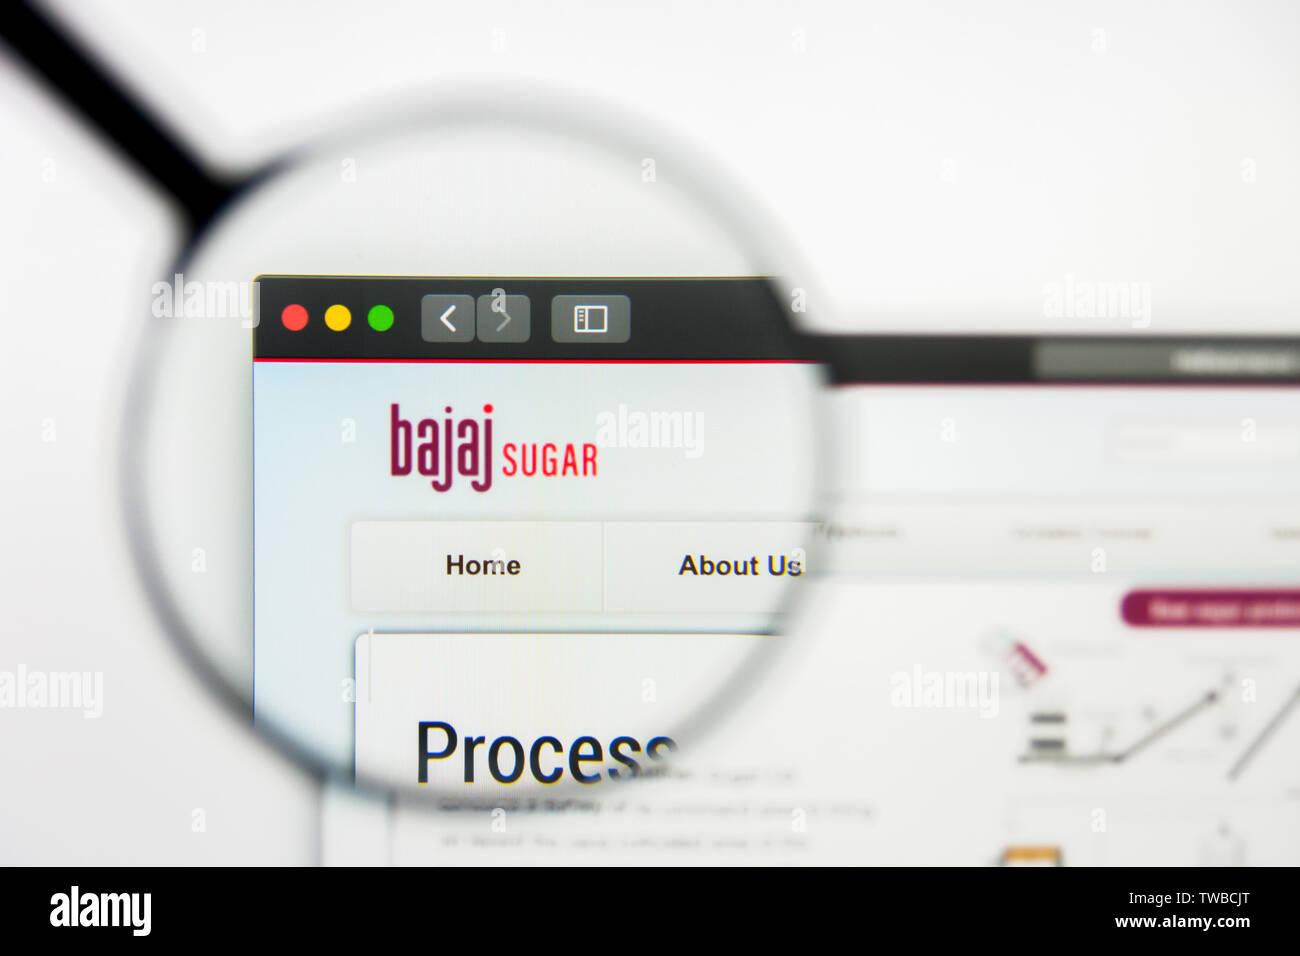 Bajaj Stock Photos & Bajaj Stock Images - Page 2 - Alamy